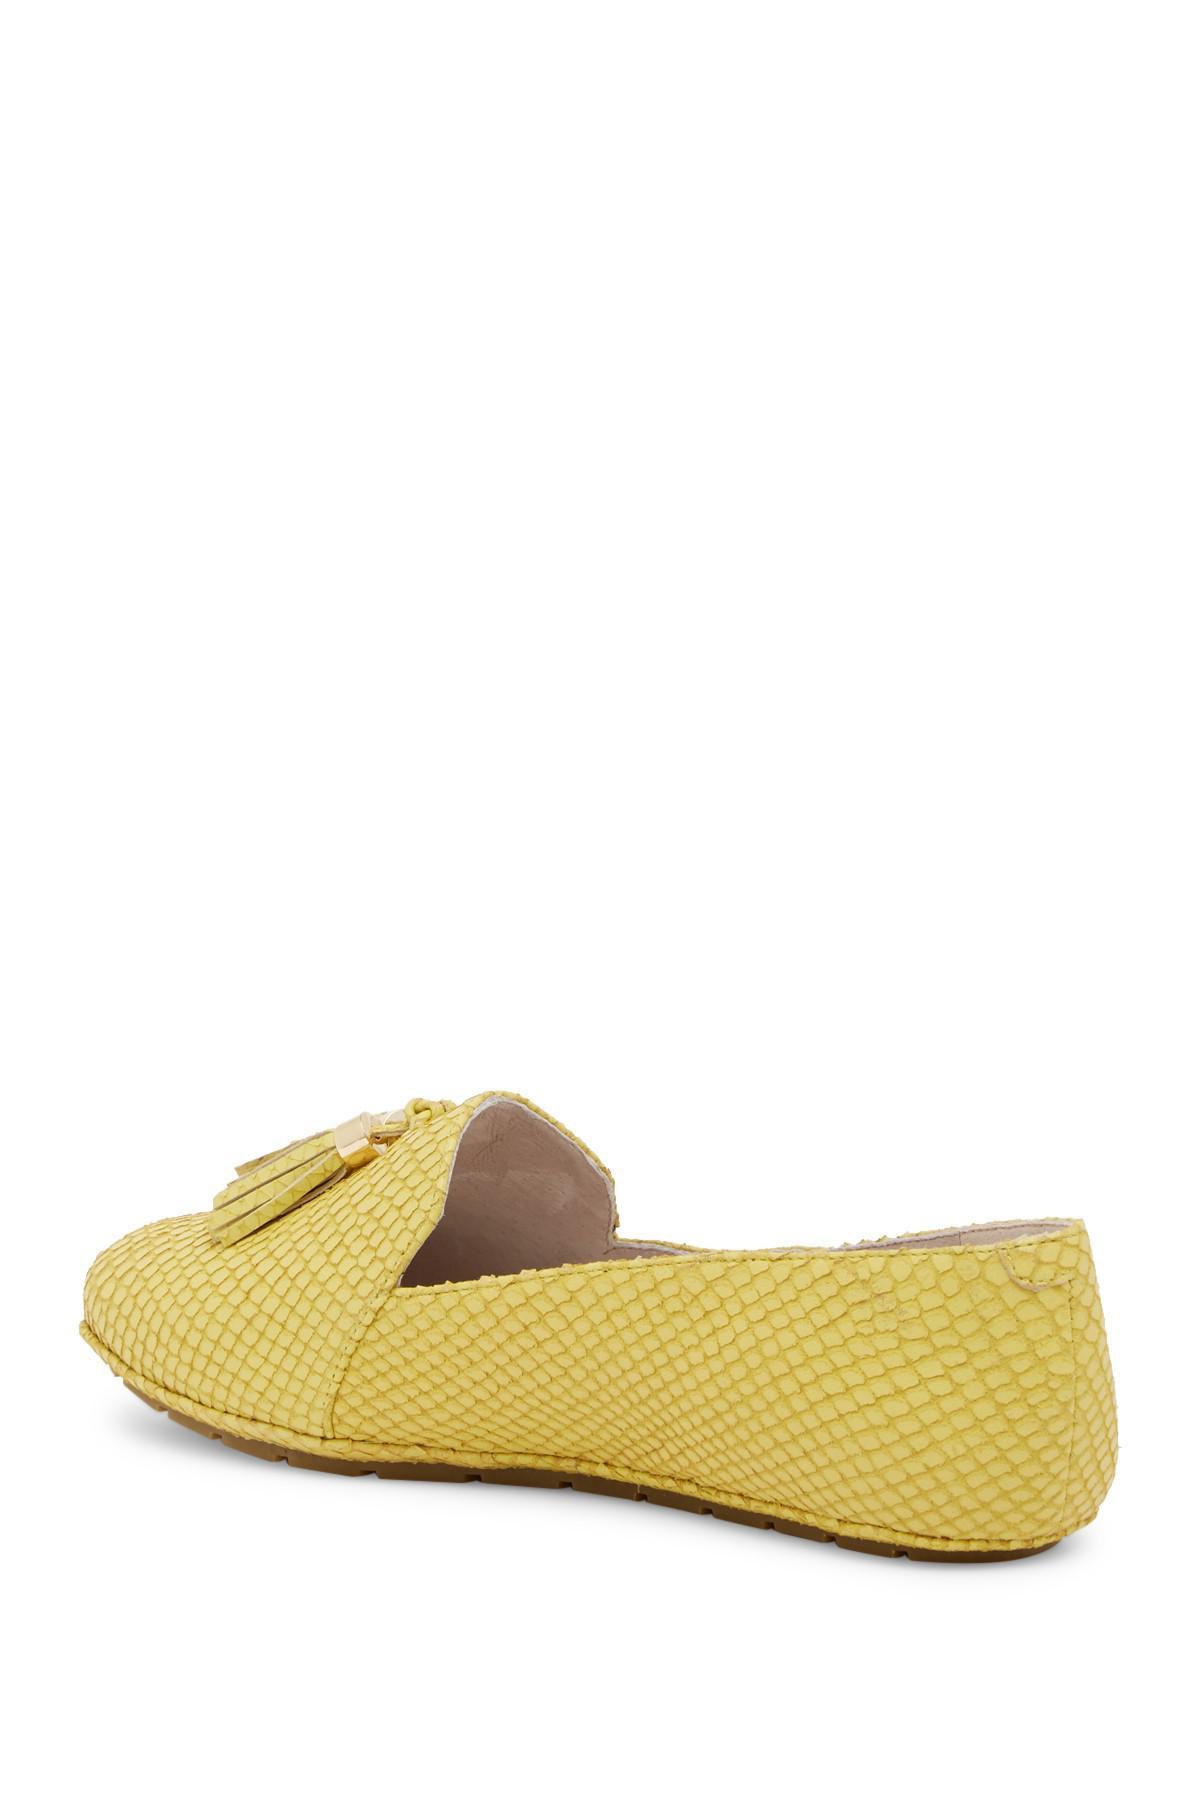 Kenneth Cole New York Julian Suede Flat Sandal hAH31G